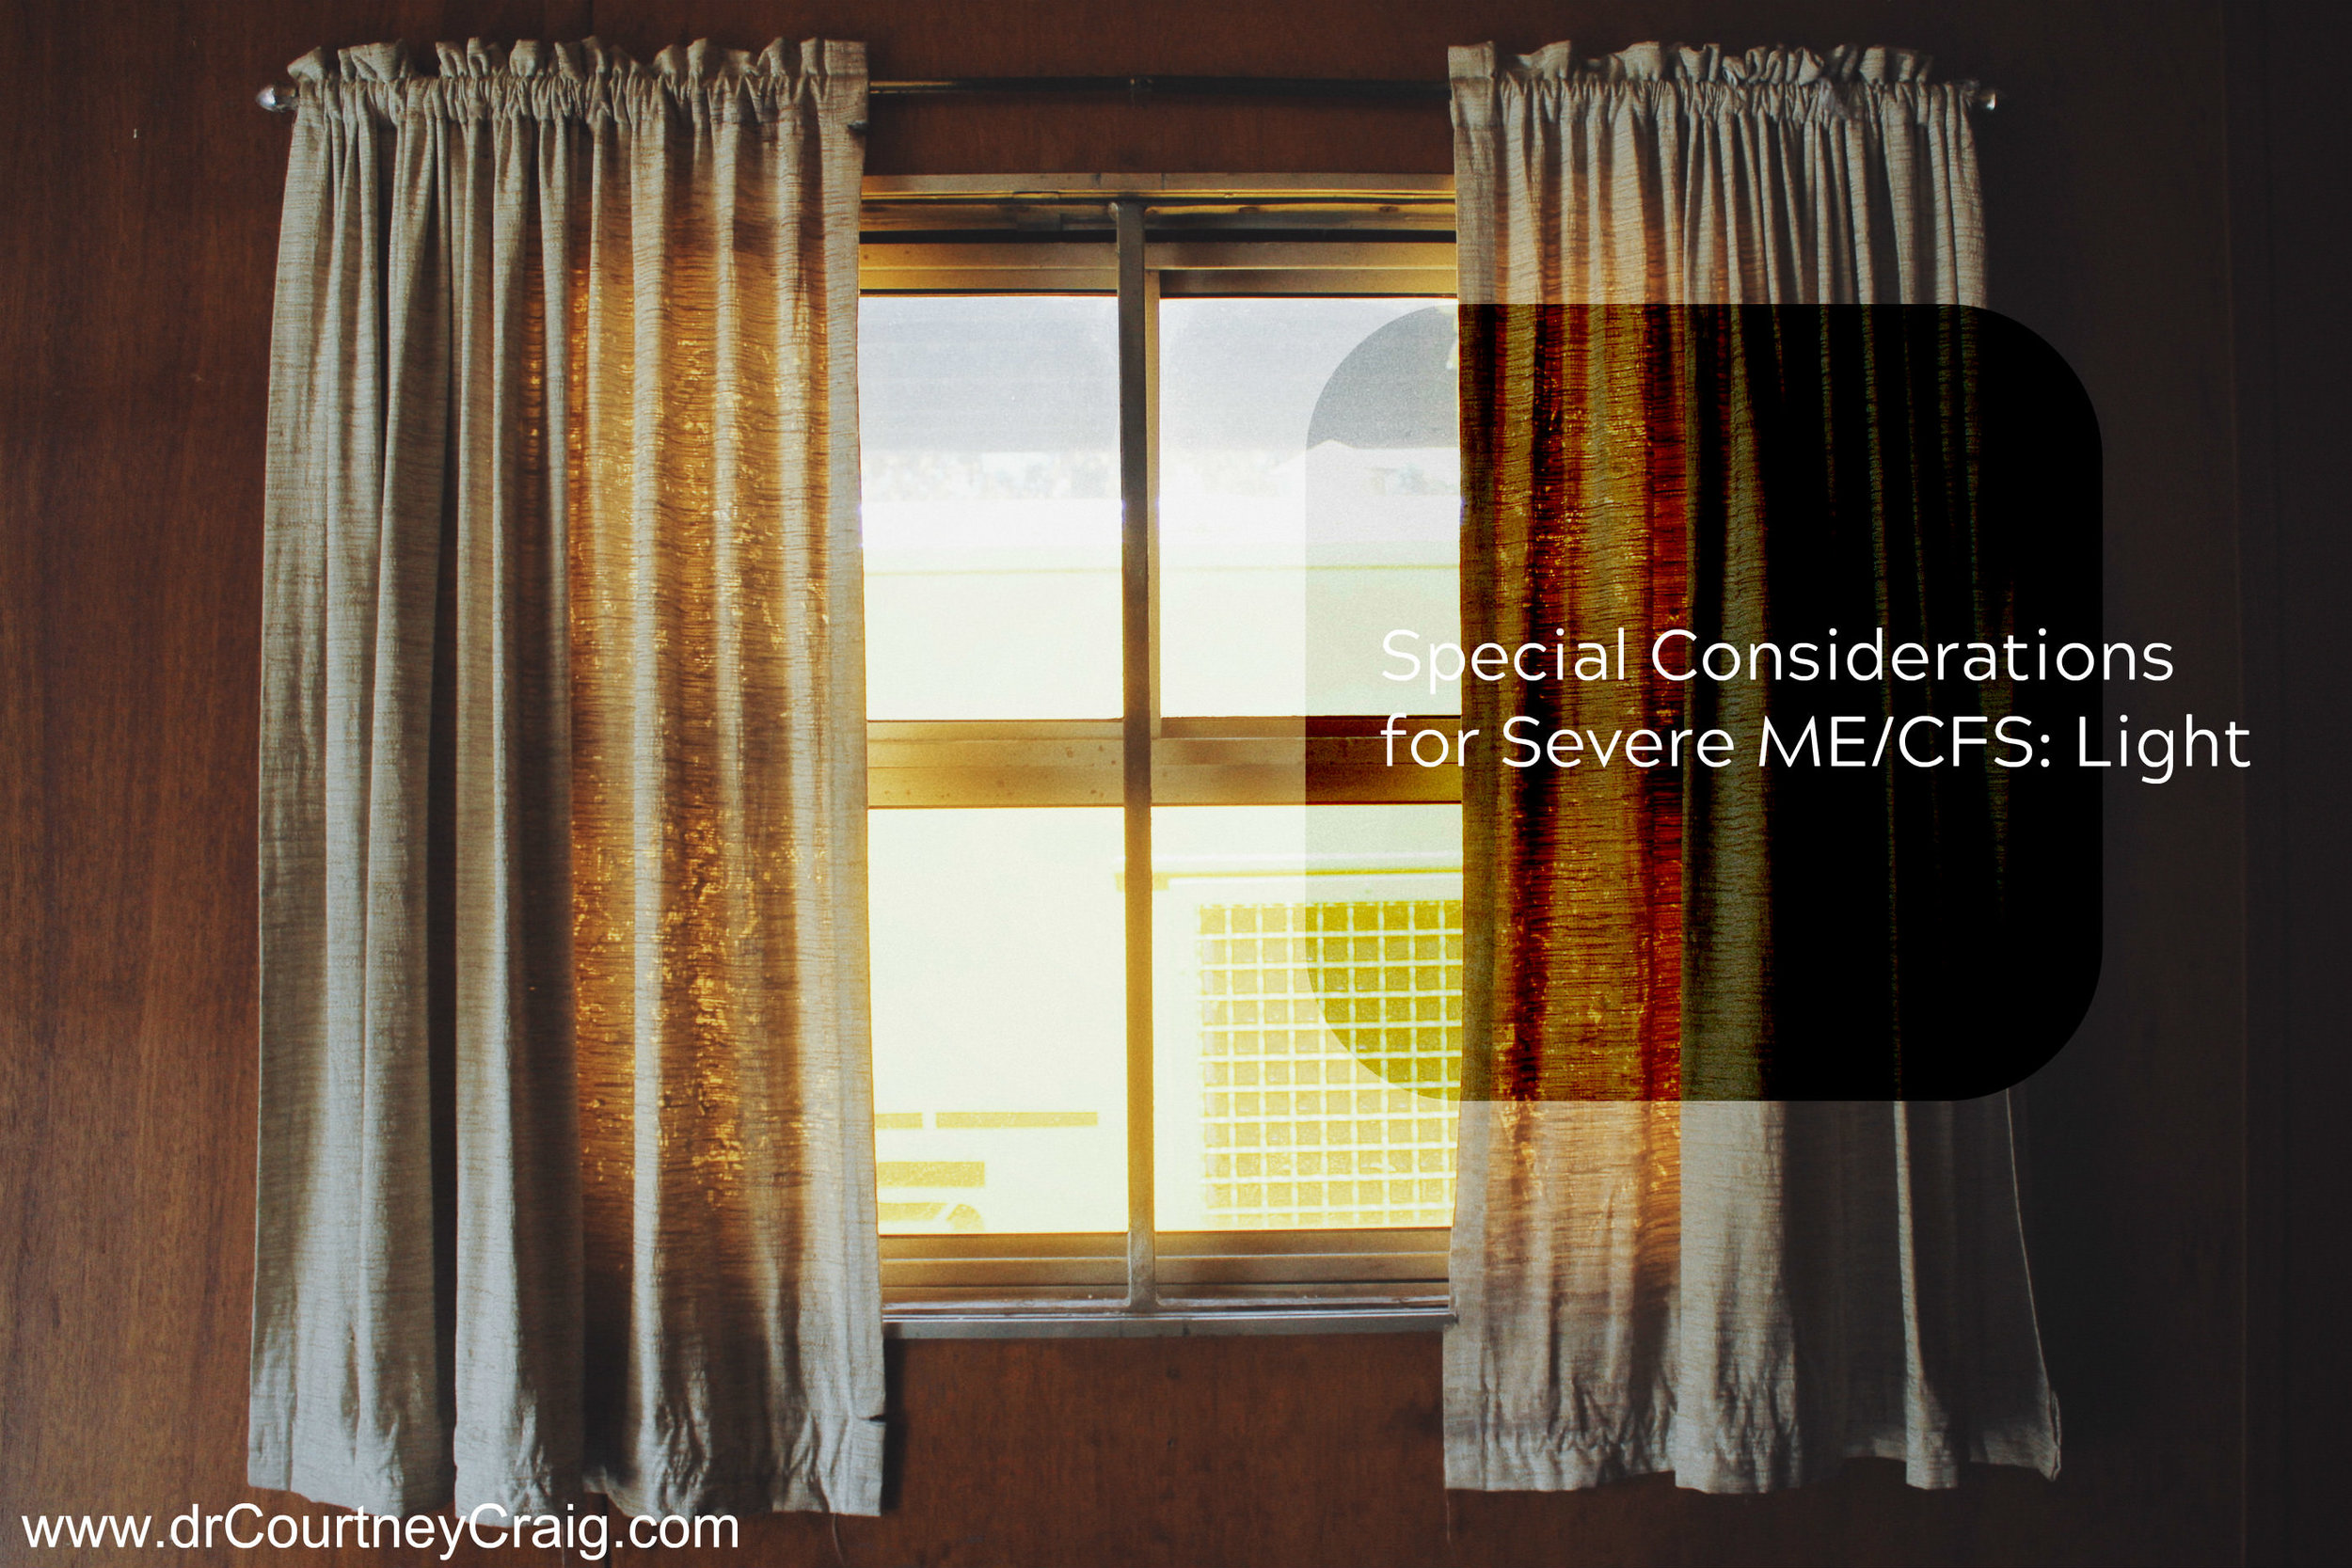 light-deficiency- in-severe-mecfs